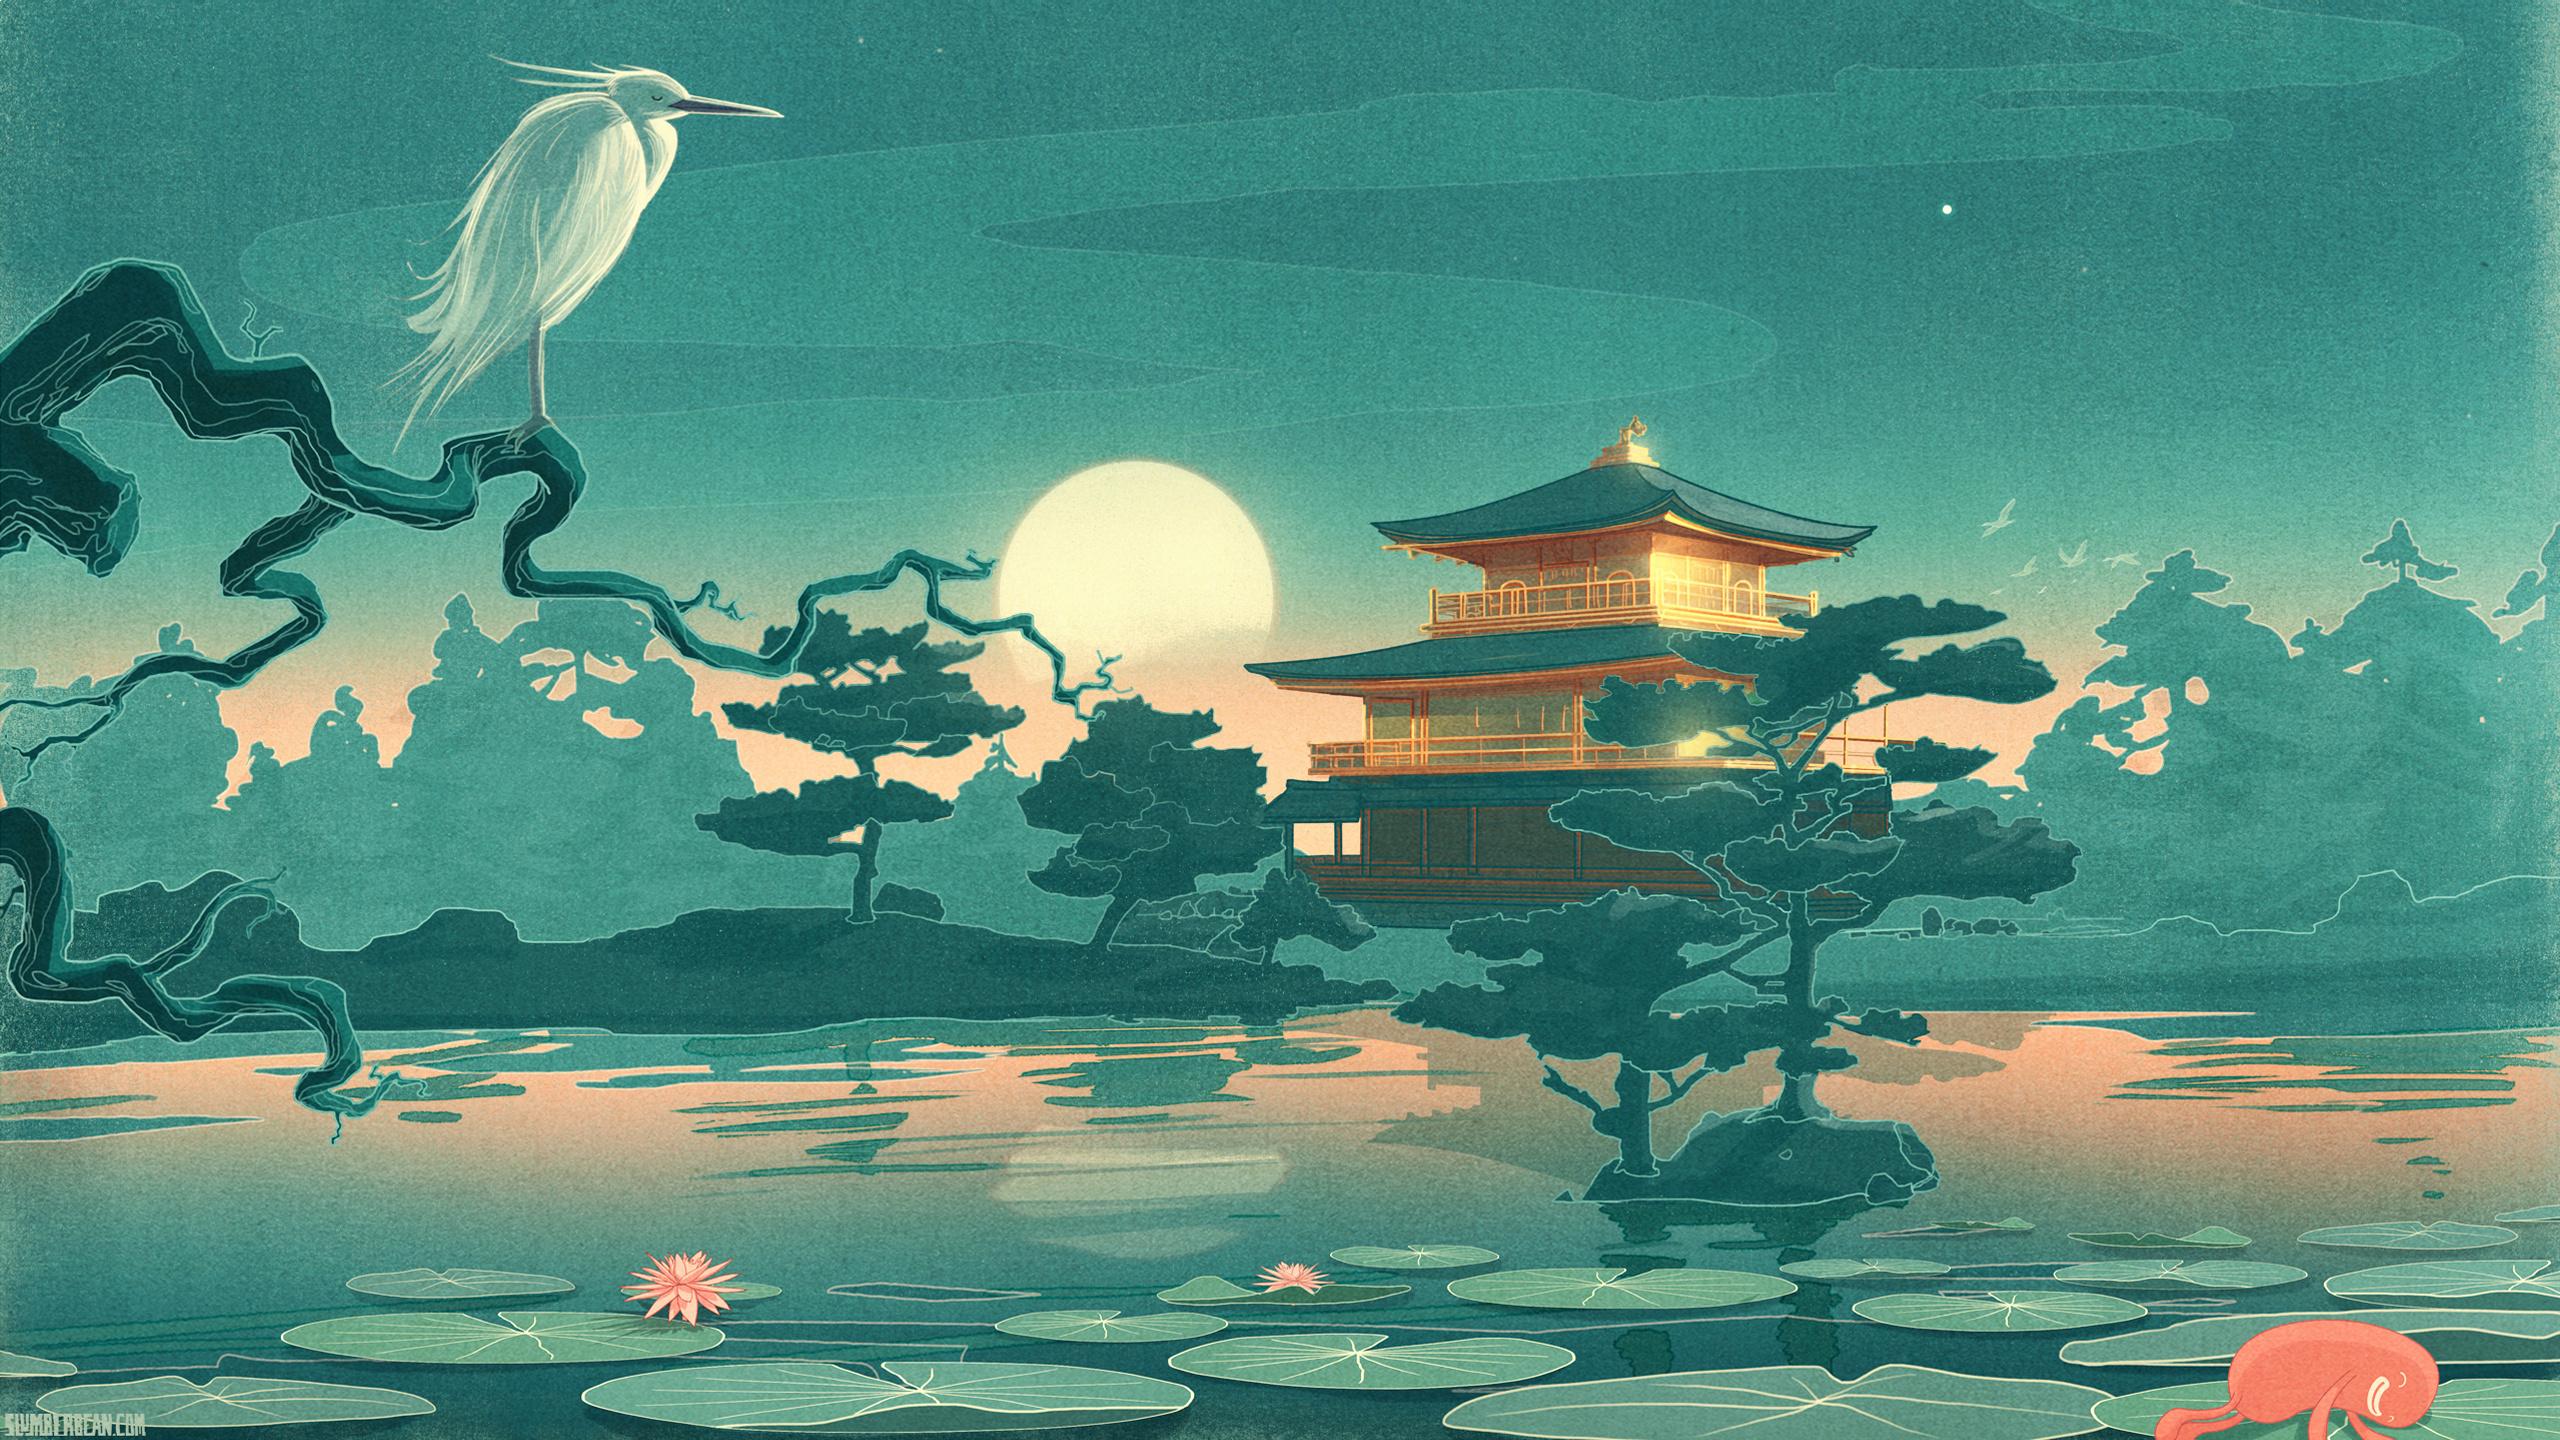 Japanese Art Wallpaper 2560x1440 43823